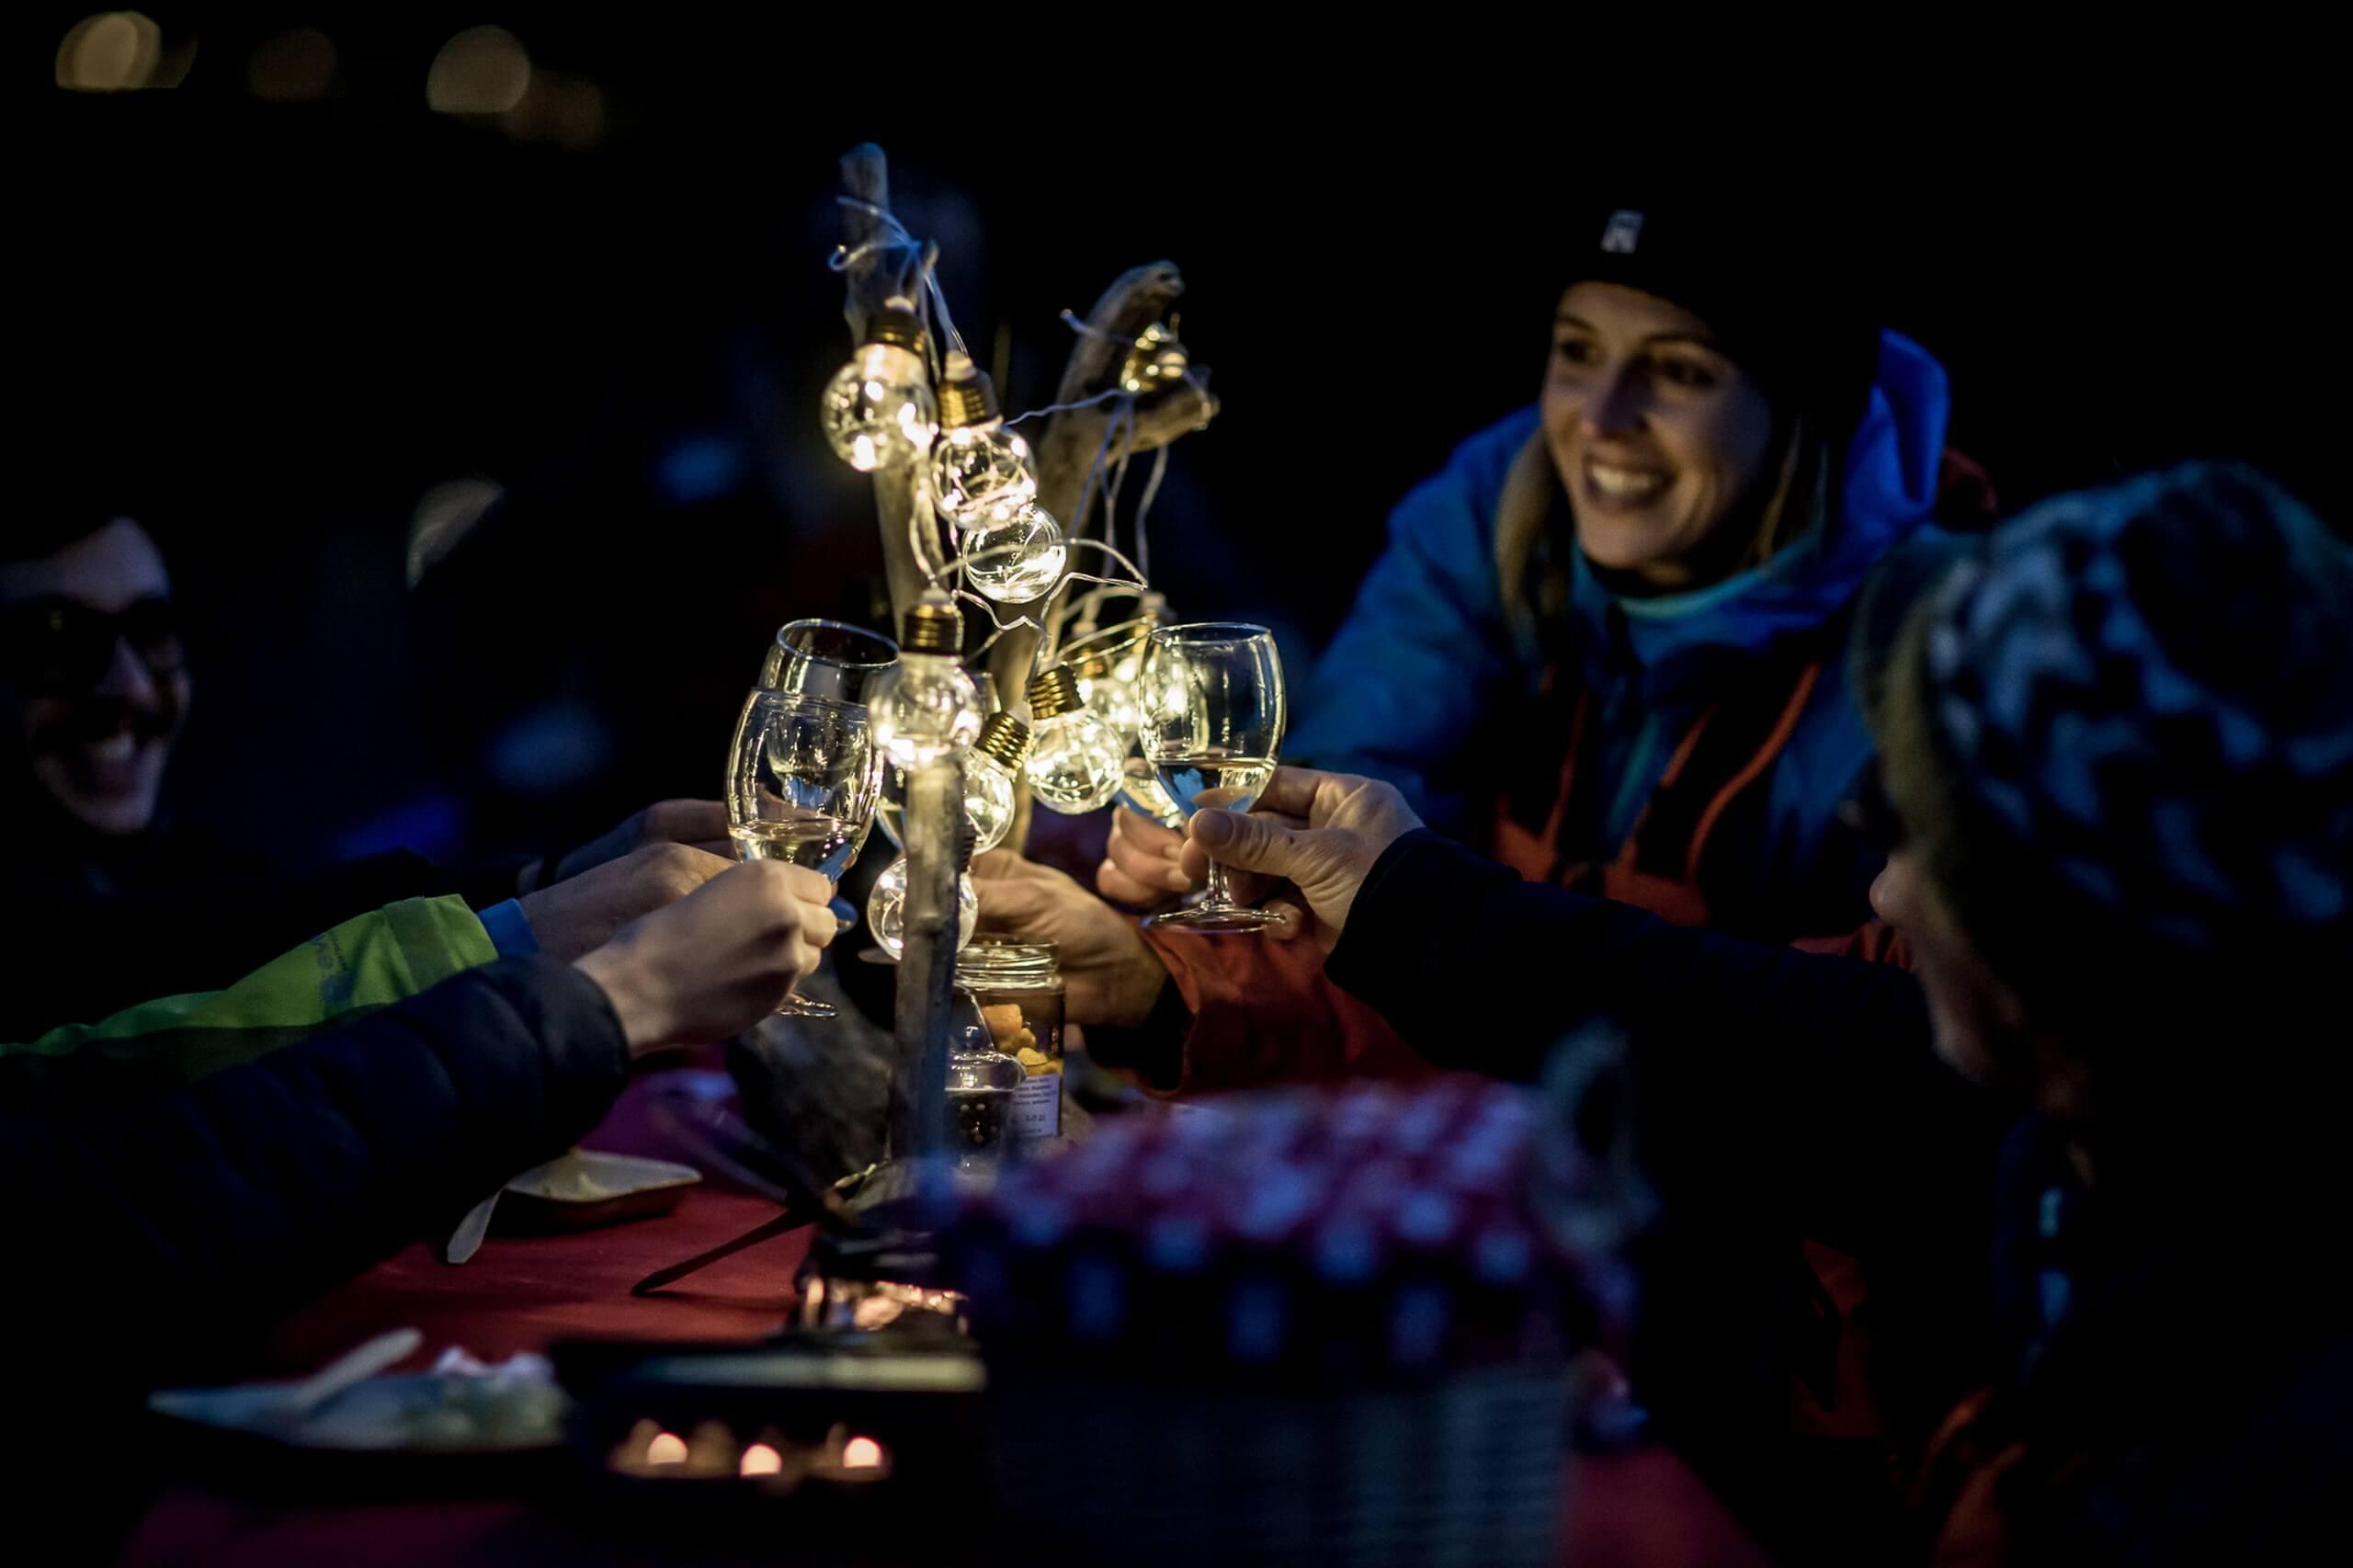 raclette-rafting-outdoor-interlaken-chillipictures-nacht.jpg